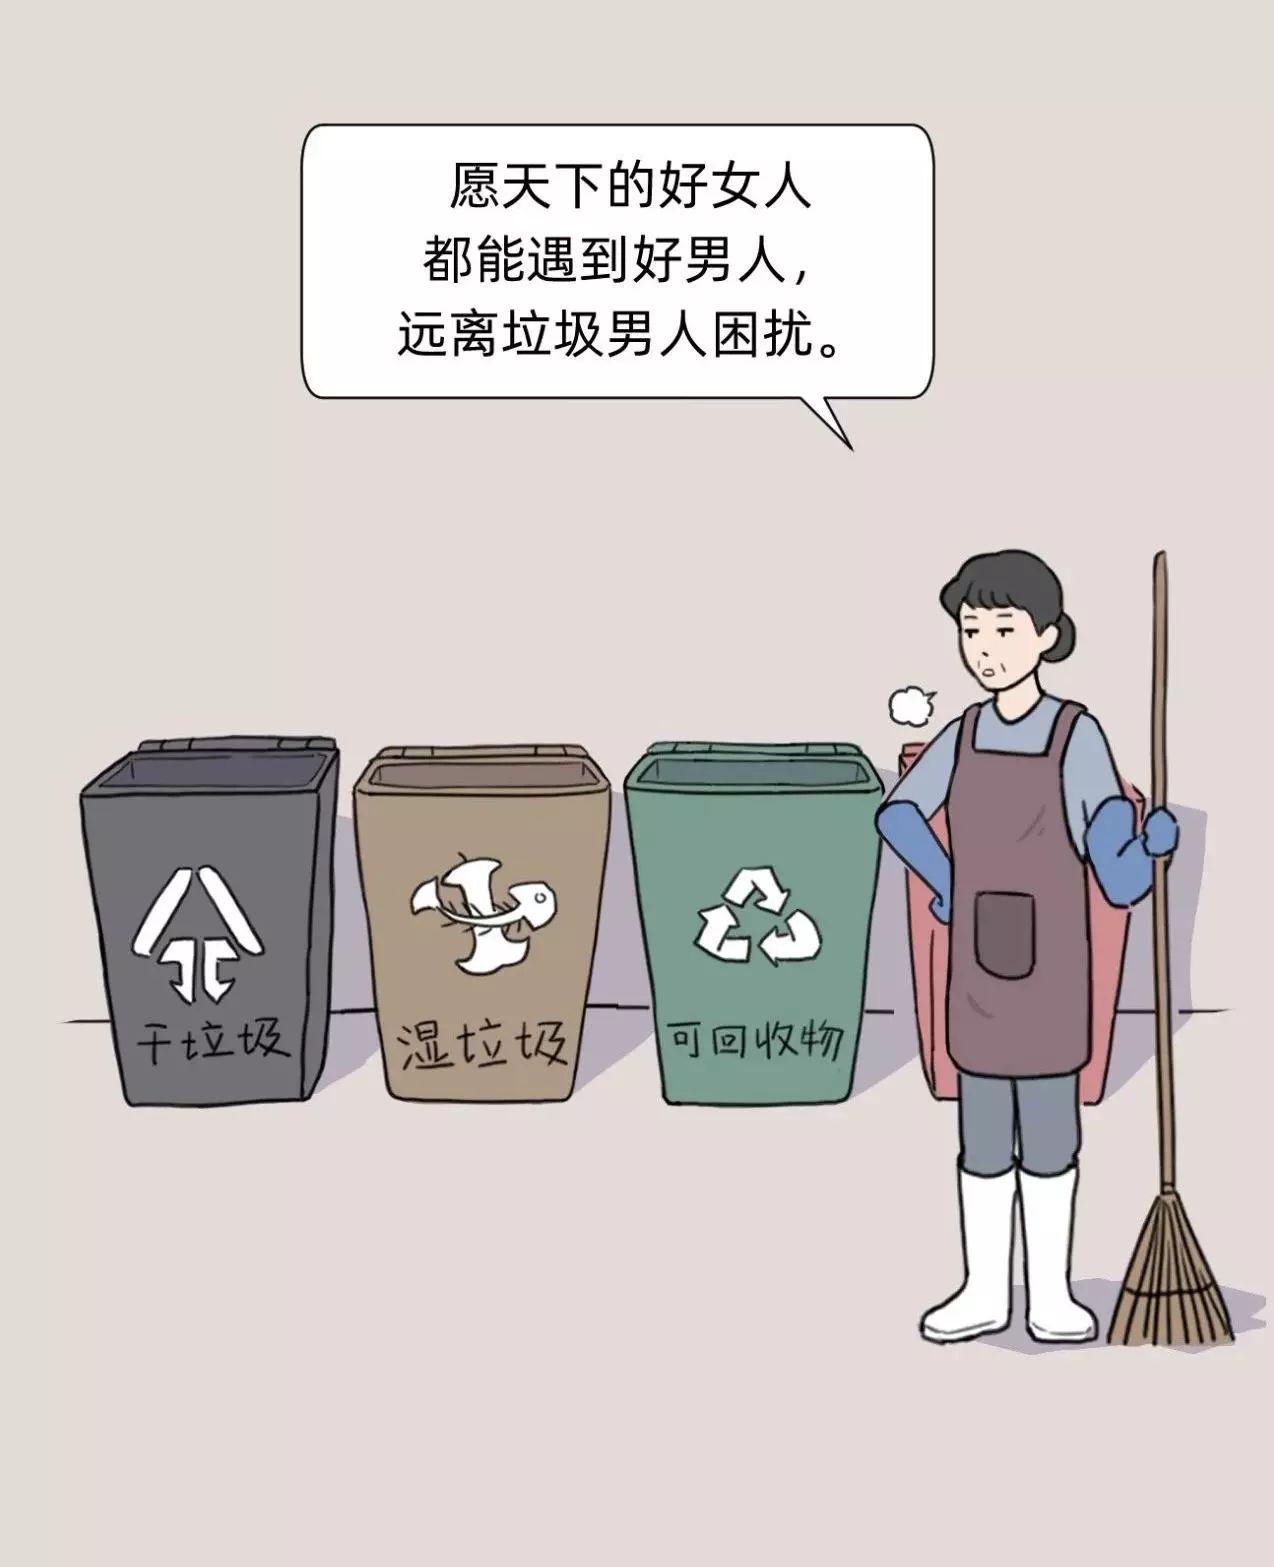 【南溪�t娘】垃圾分�!男人分�?